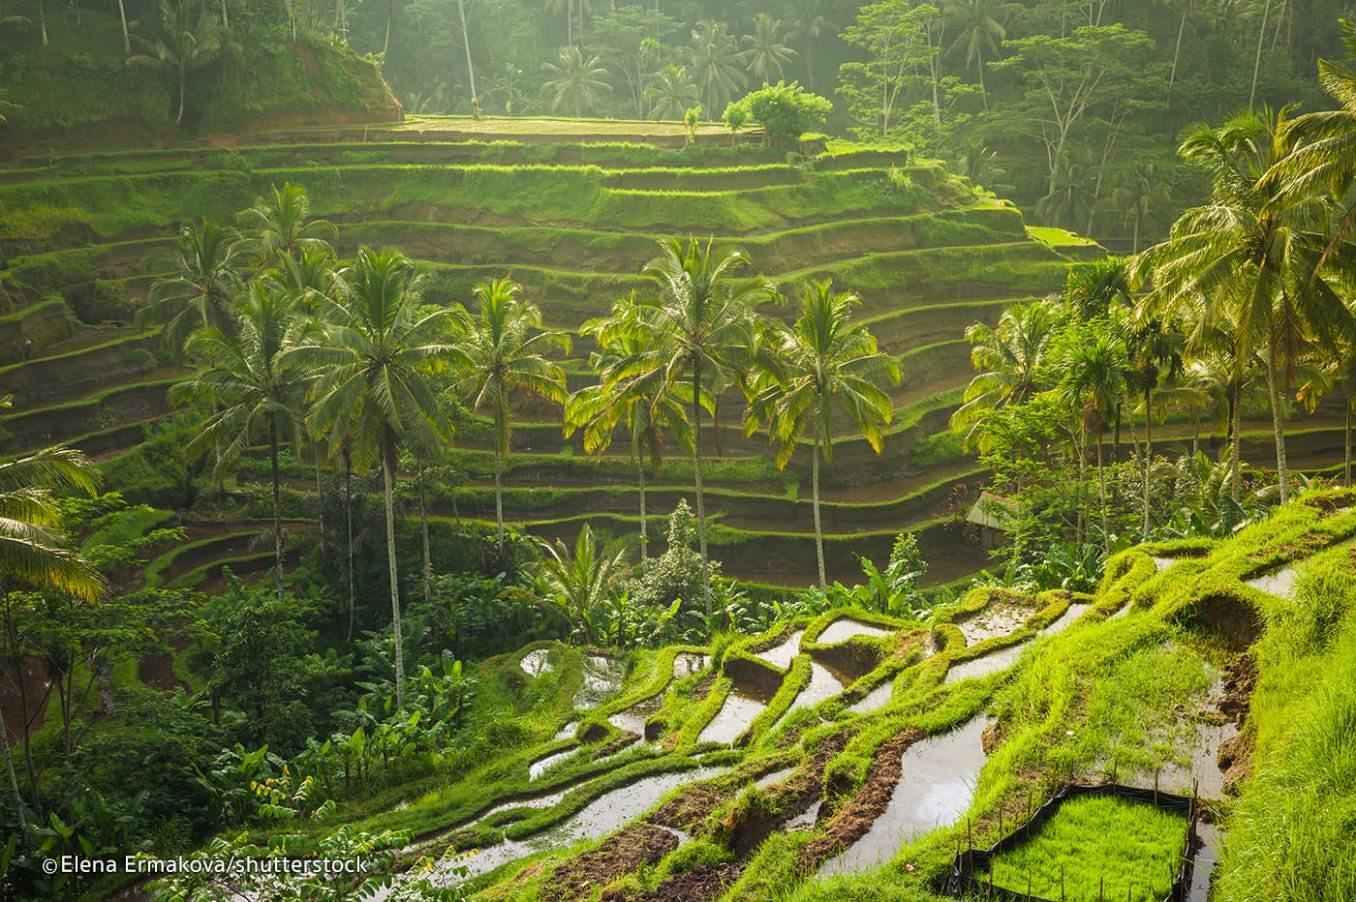 indonesian-experience-ubud-5-4a0381f69f6